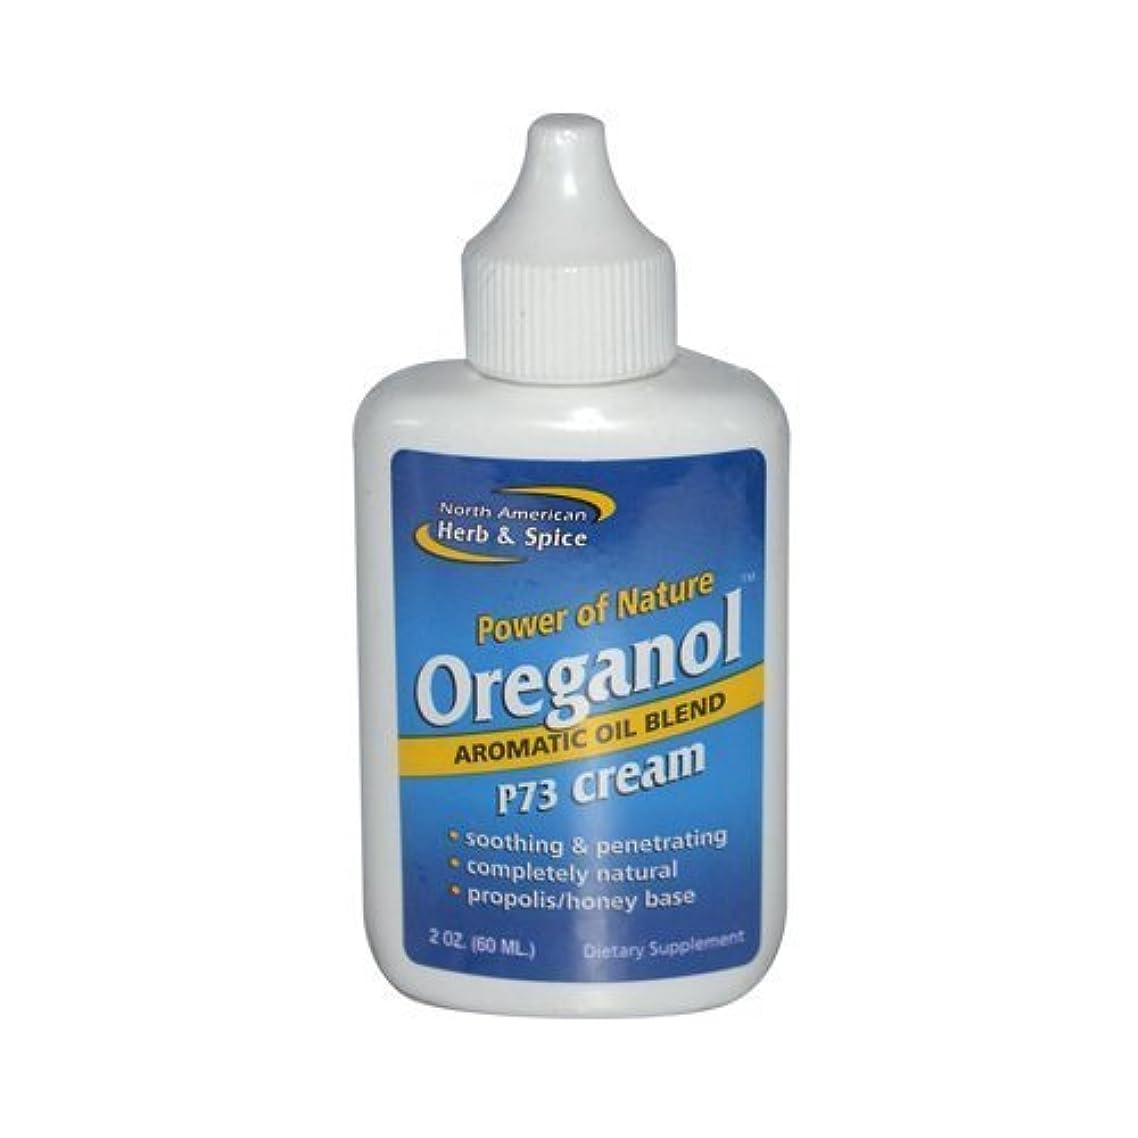 North American Herb And Spice Oreganol Cream - 2 oz, 2 pack by NORTH AMERICAN HERB & SPICE